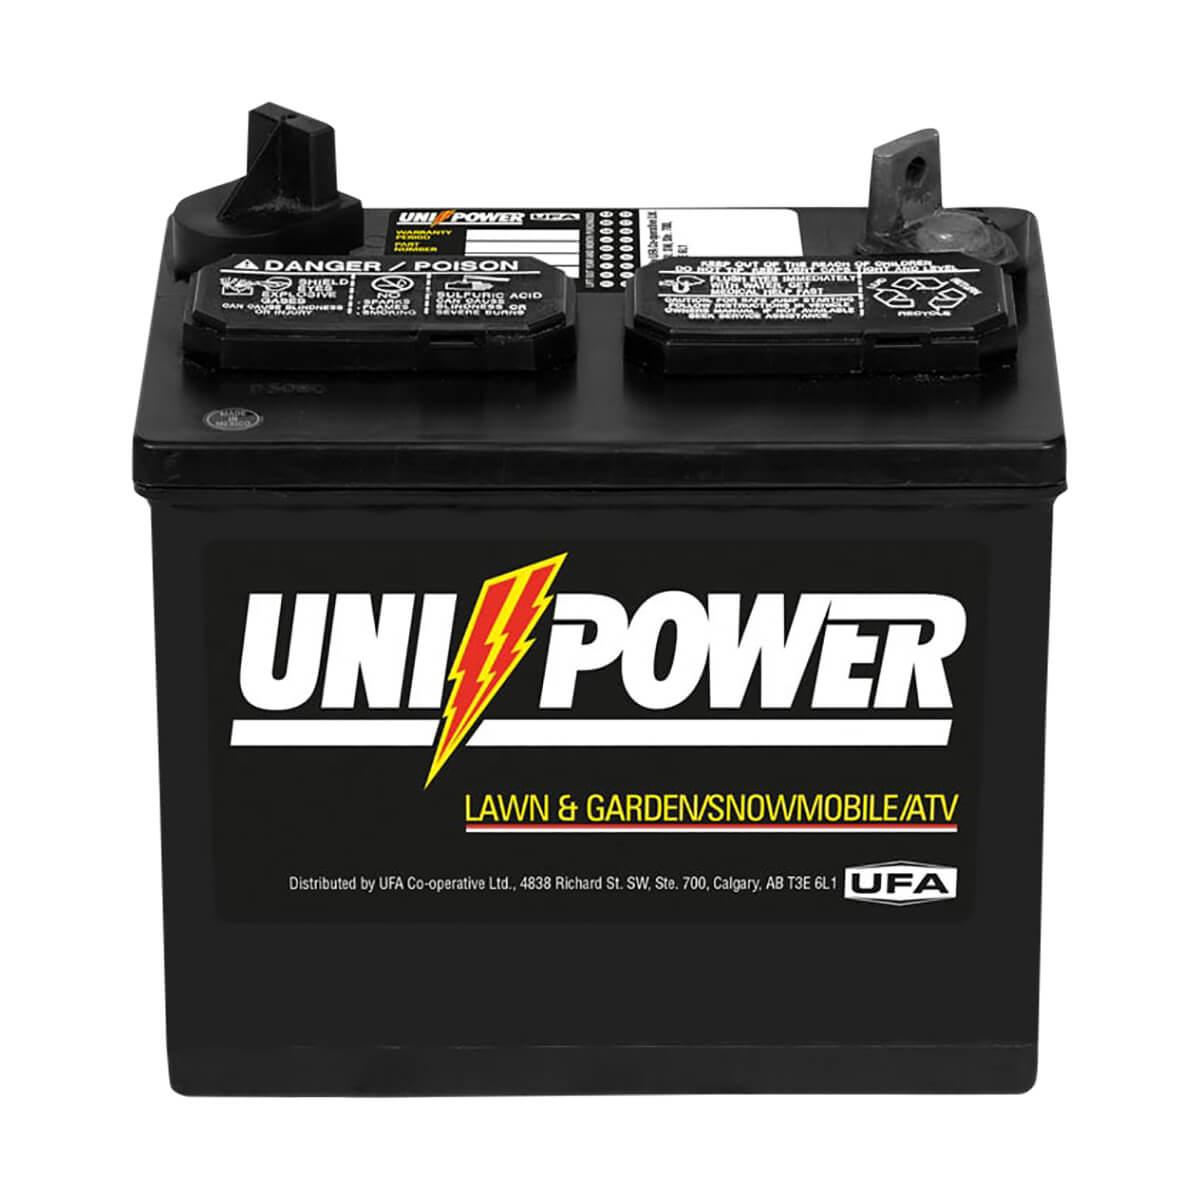 Uni-Power Medium Duty Lawn and Garden 12 Volt Battery - 8-U-1P